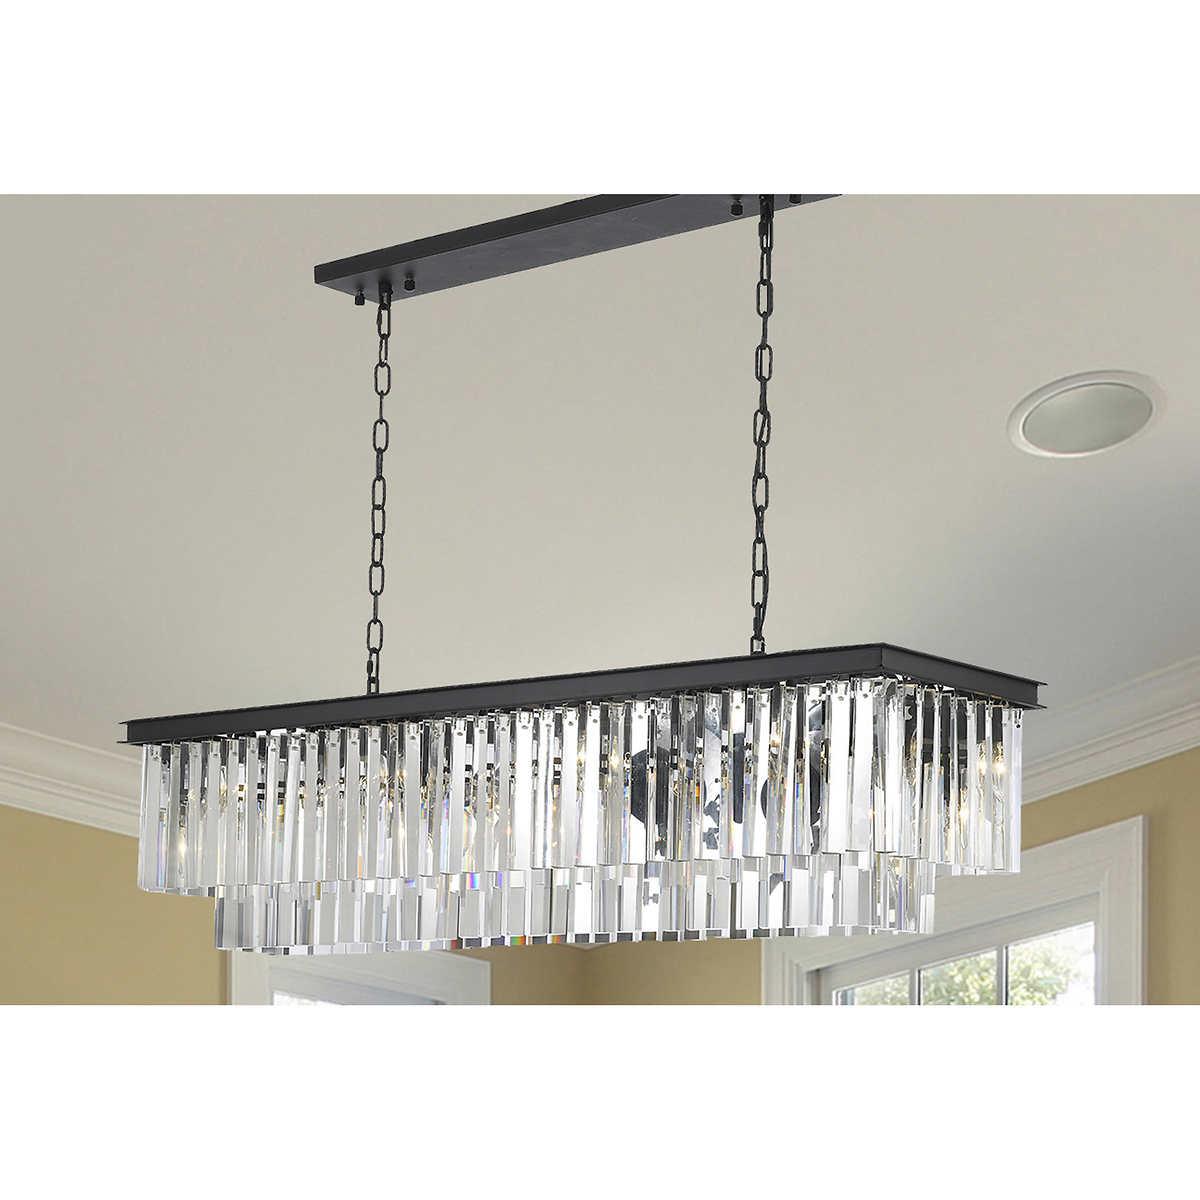 chandeliers, Lighting ideas